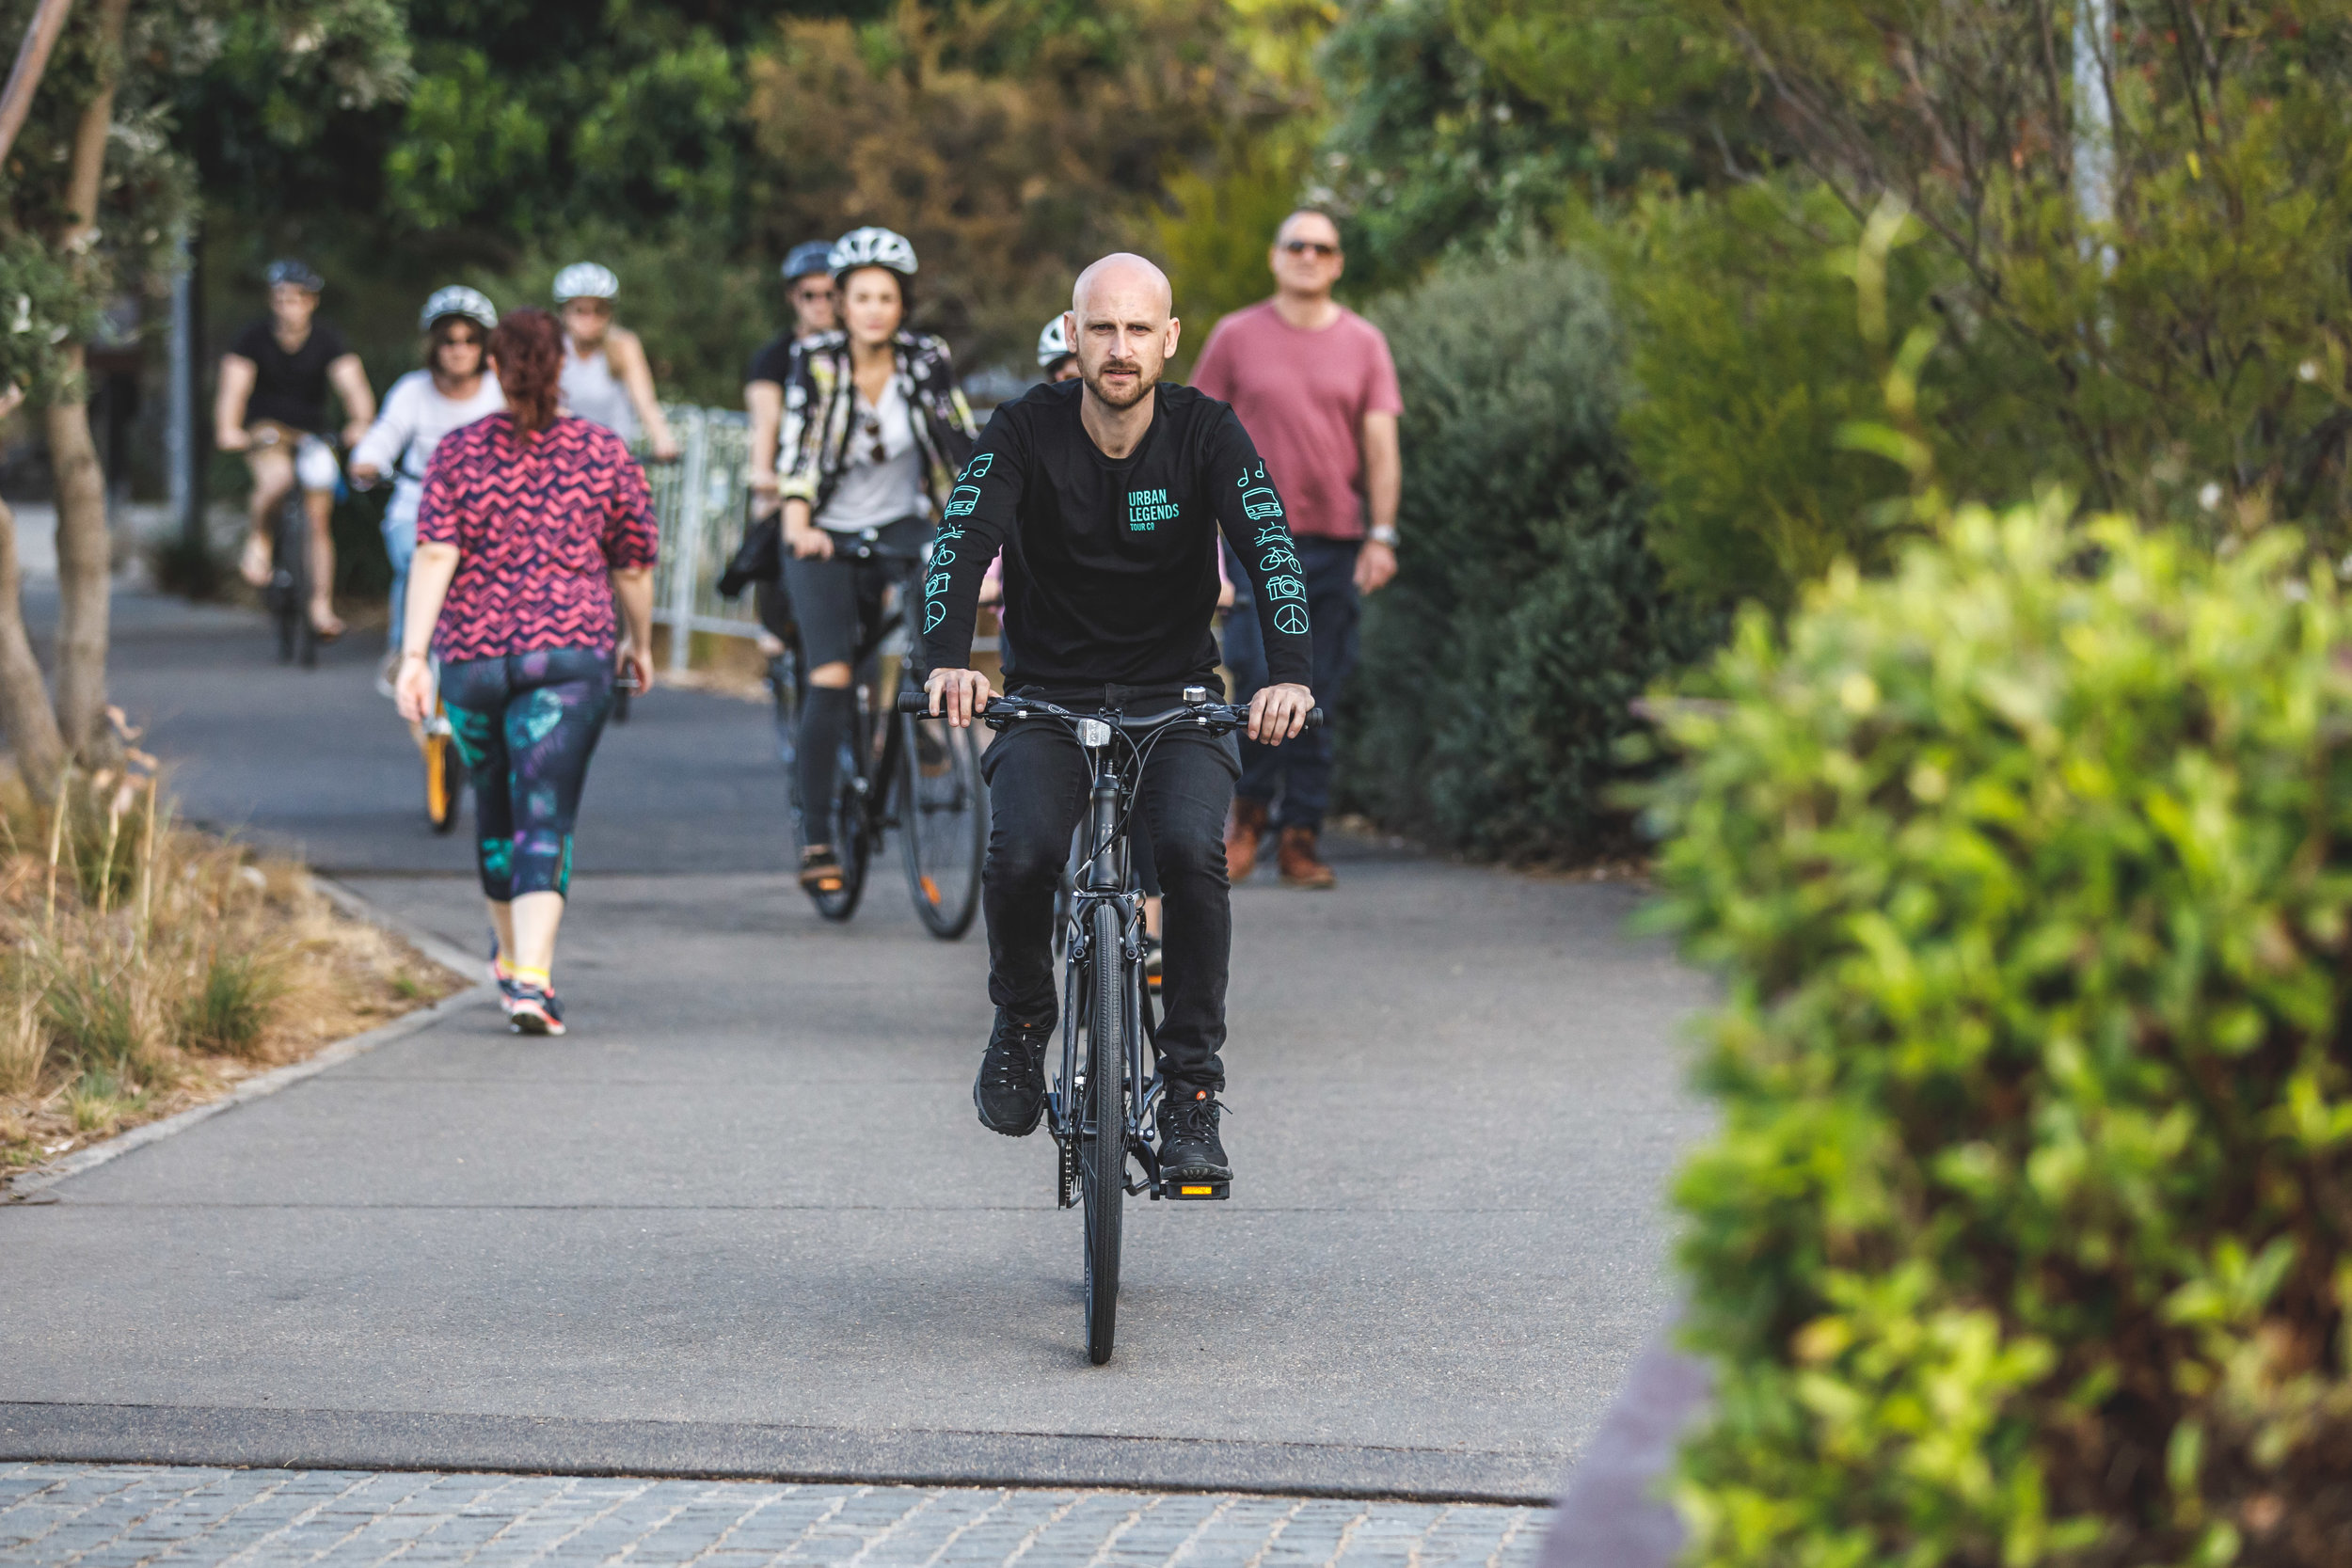 Bike Tours  Explore Sydney's most picturesque bicycle route on our unique bicycle tour